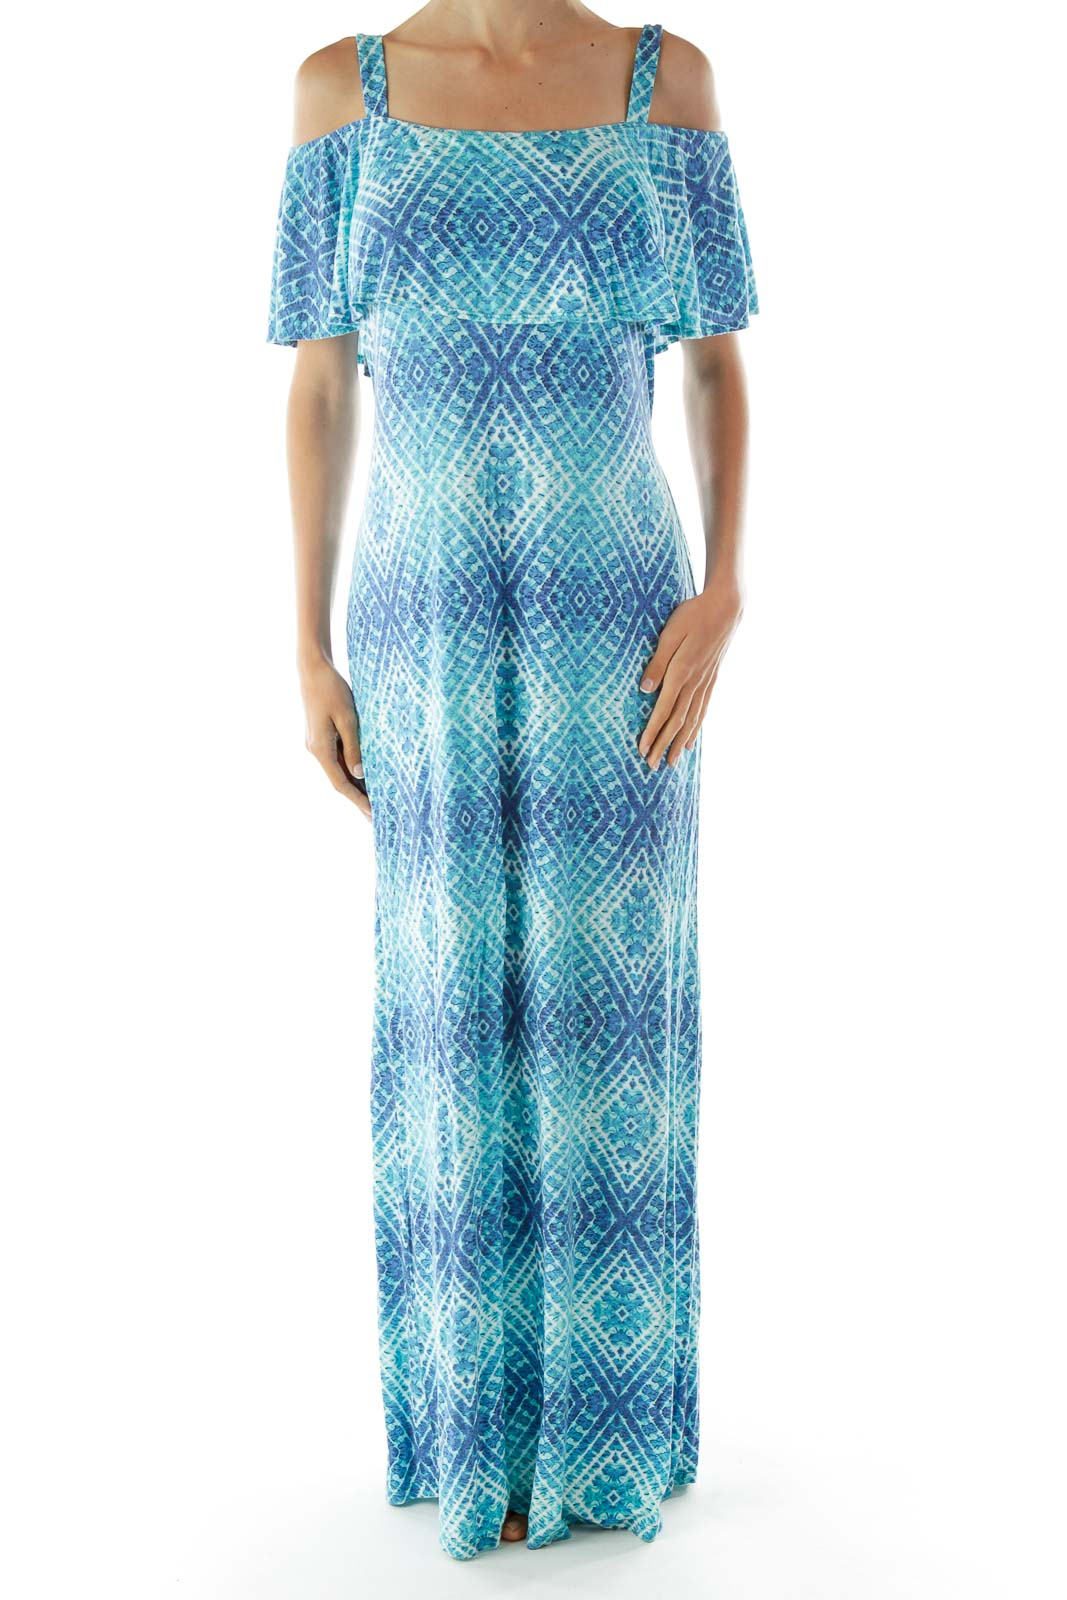 Blue White Tie Dye Cold Shoulder Day Dress